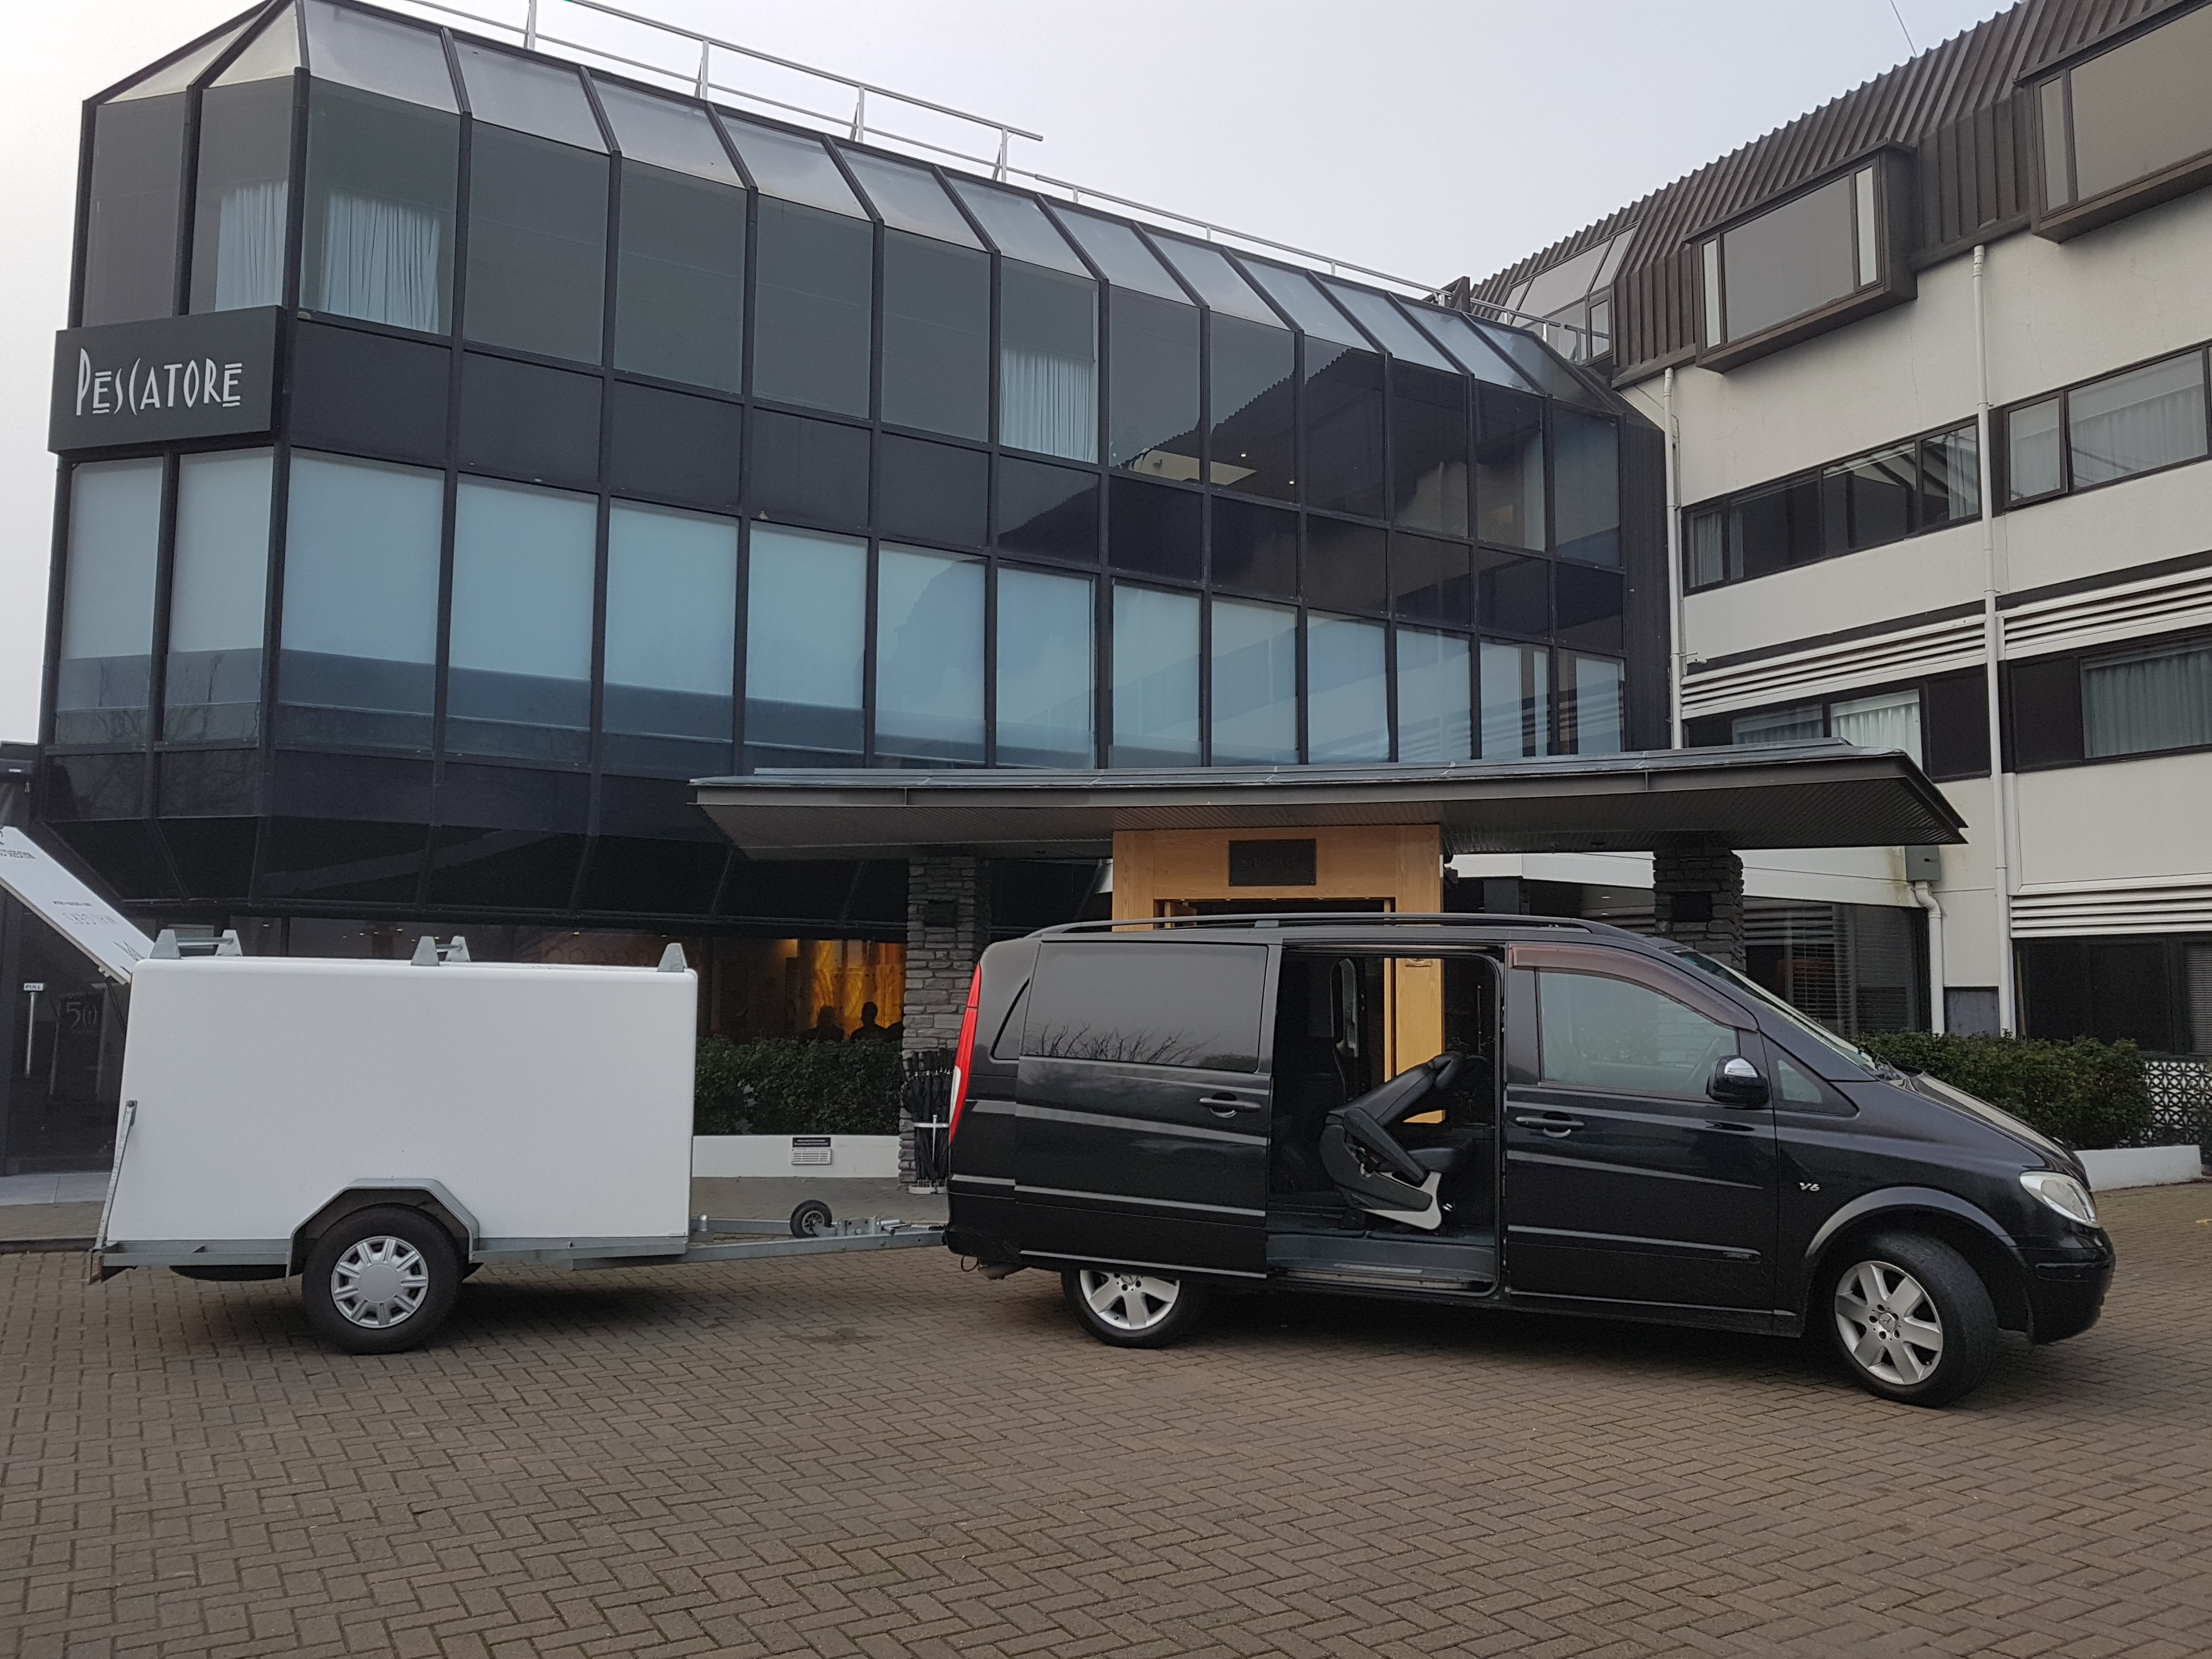 Mercedes & Trailor